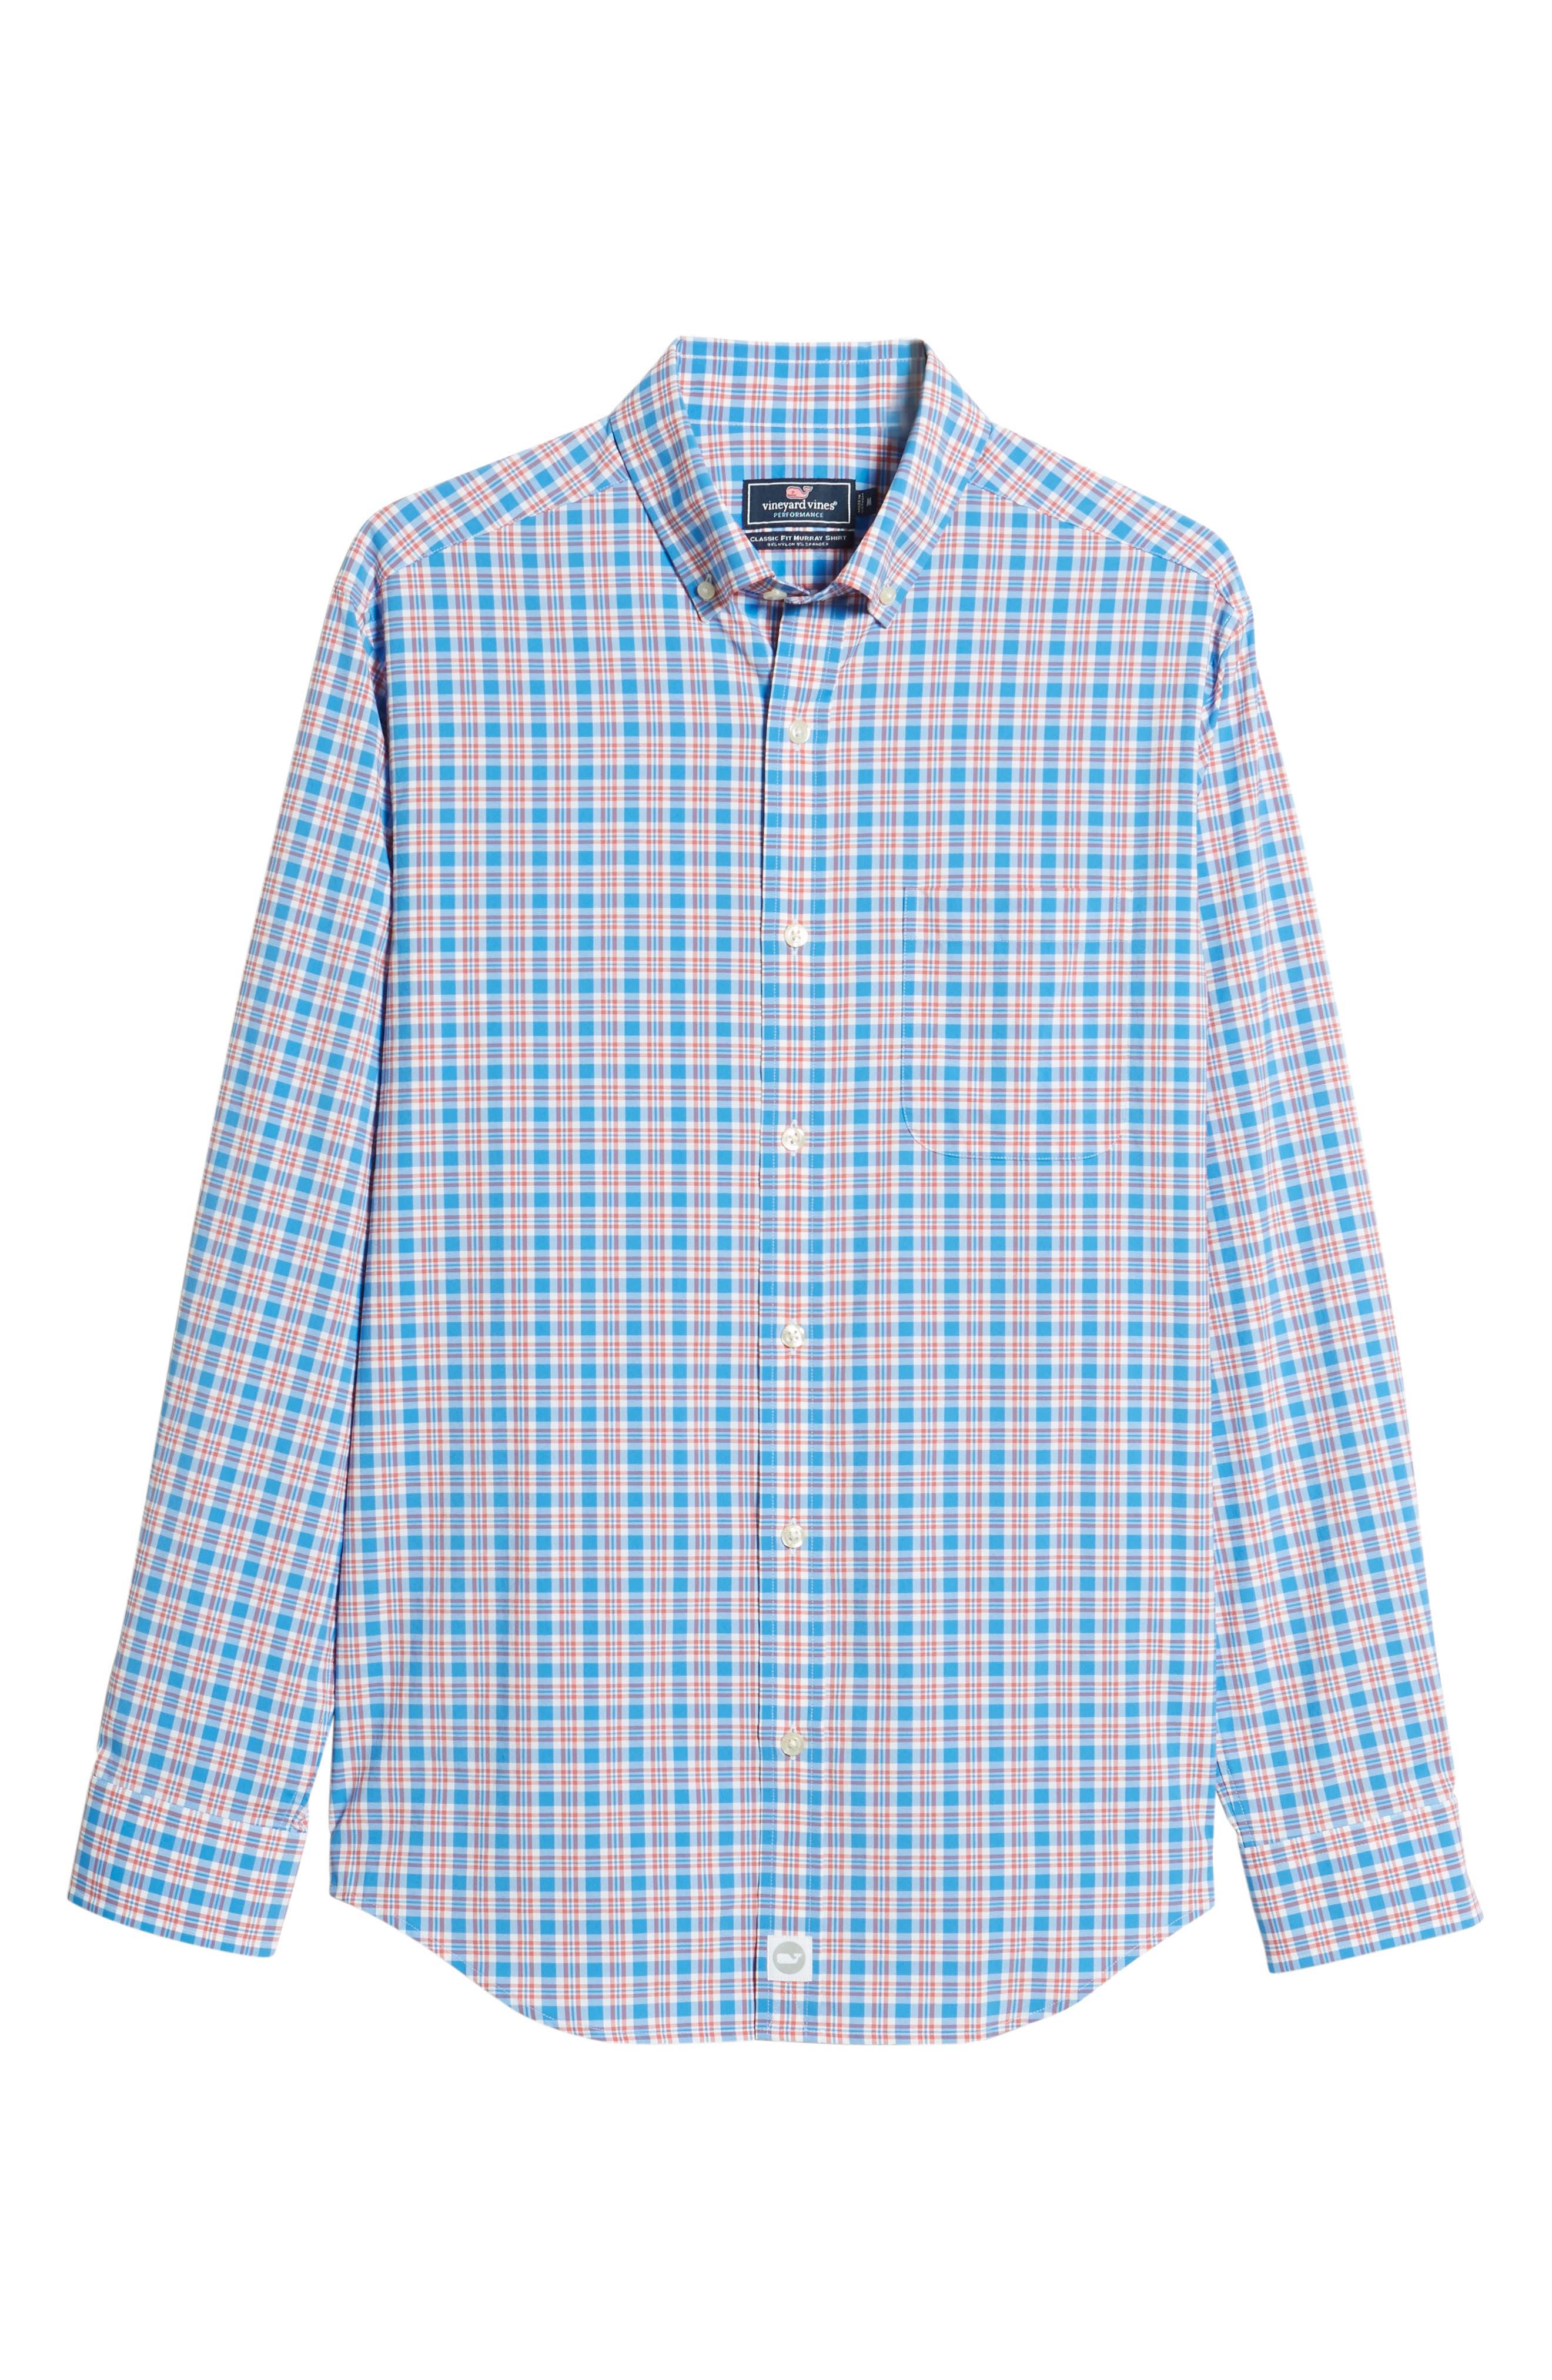 VINEYARD VINES,                             Lighthouse Road Regular Fit Plaid Sport Shirt,                             Alternate thumbnail 6, color,                             415